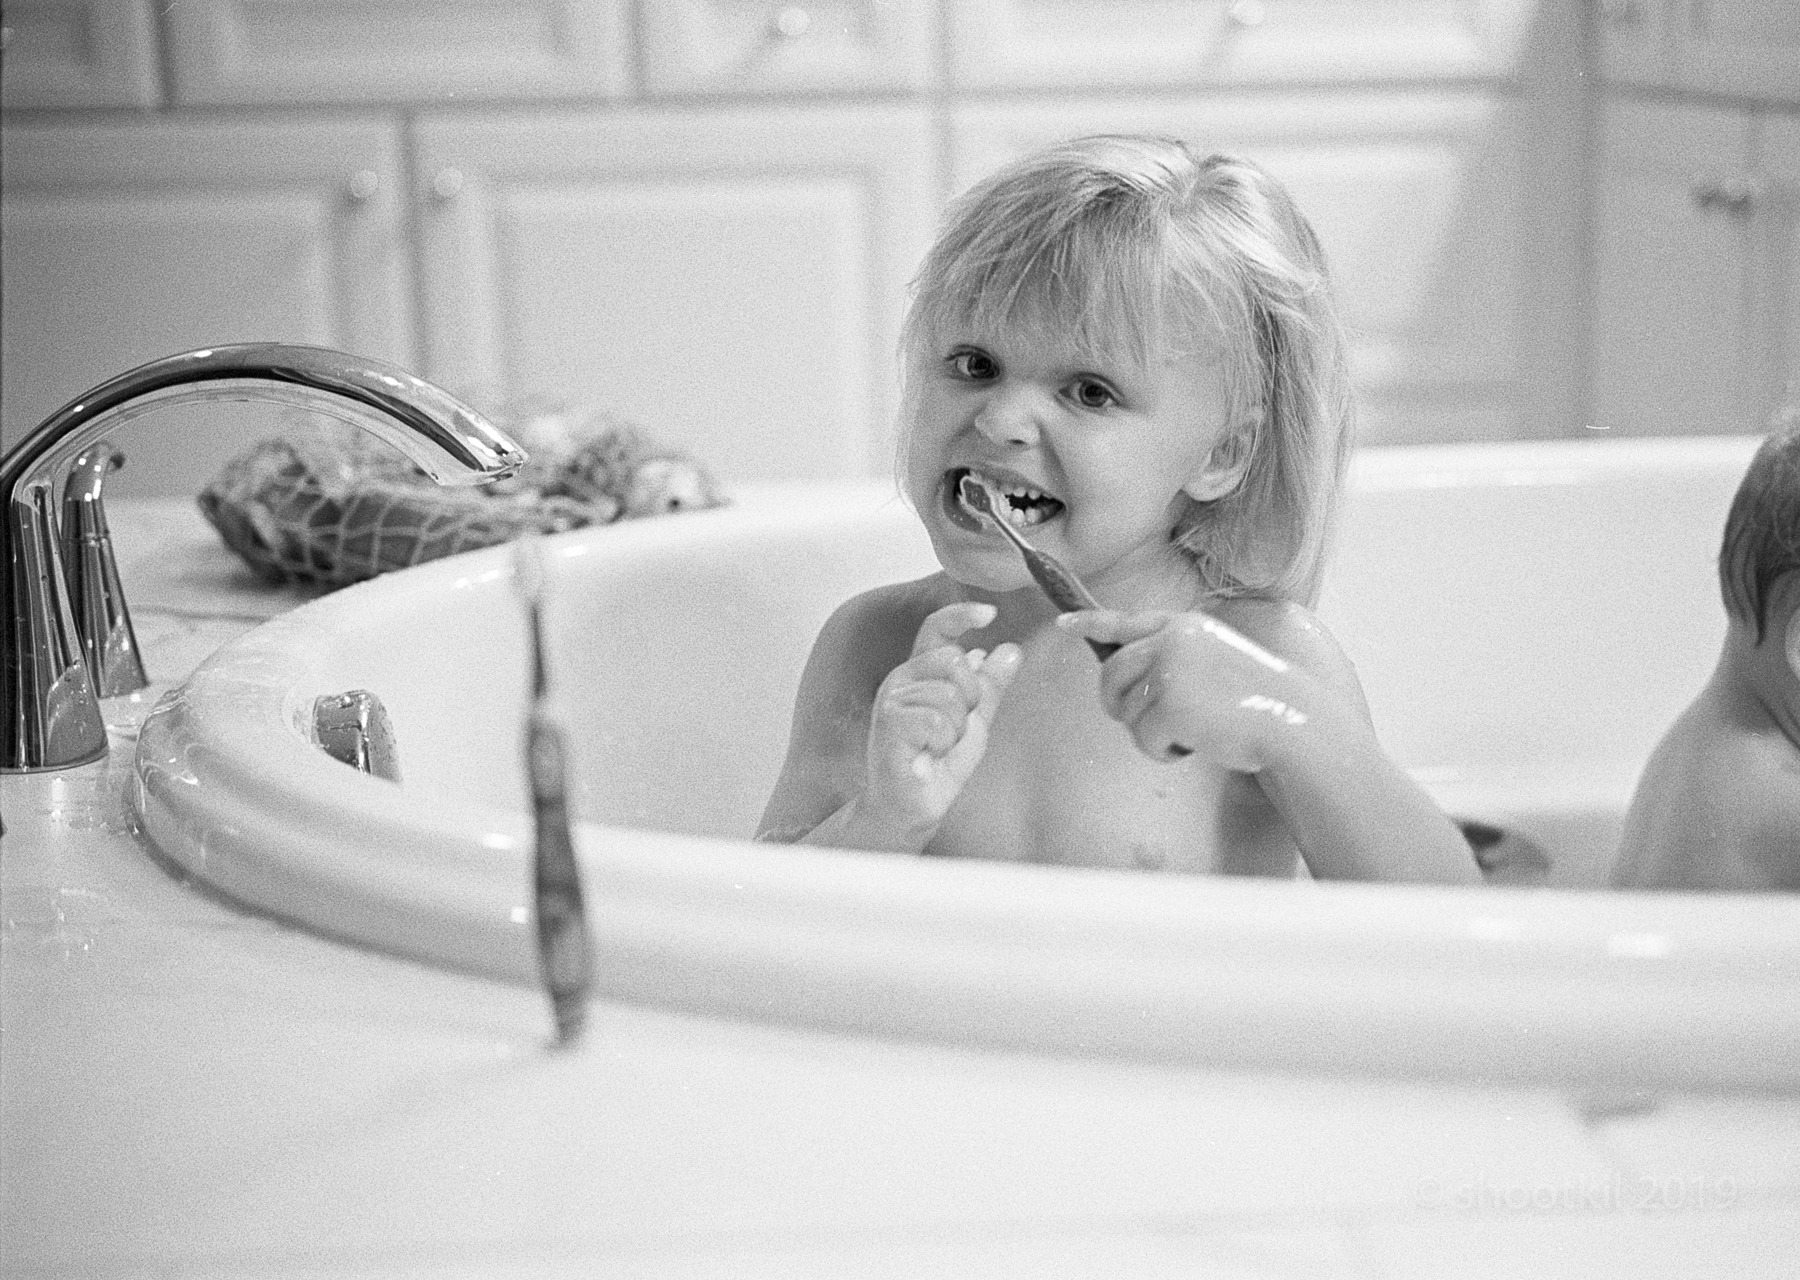 Chloe_Bath_Toothbrush.jpg